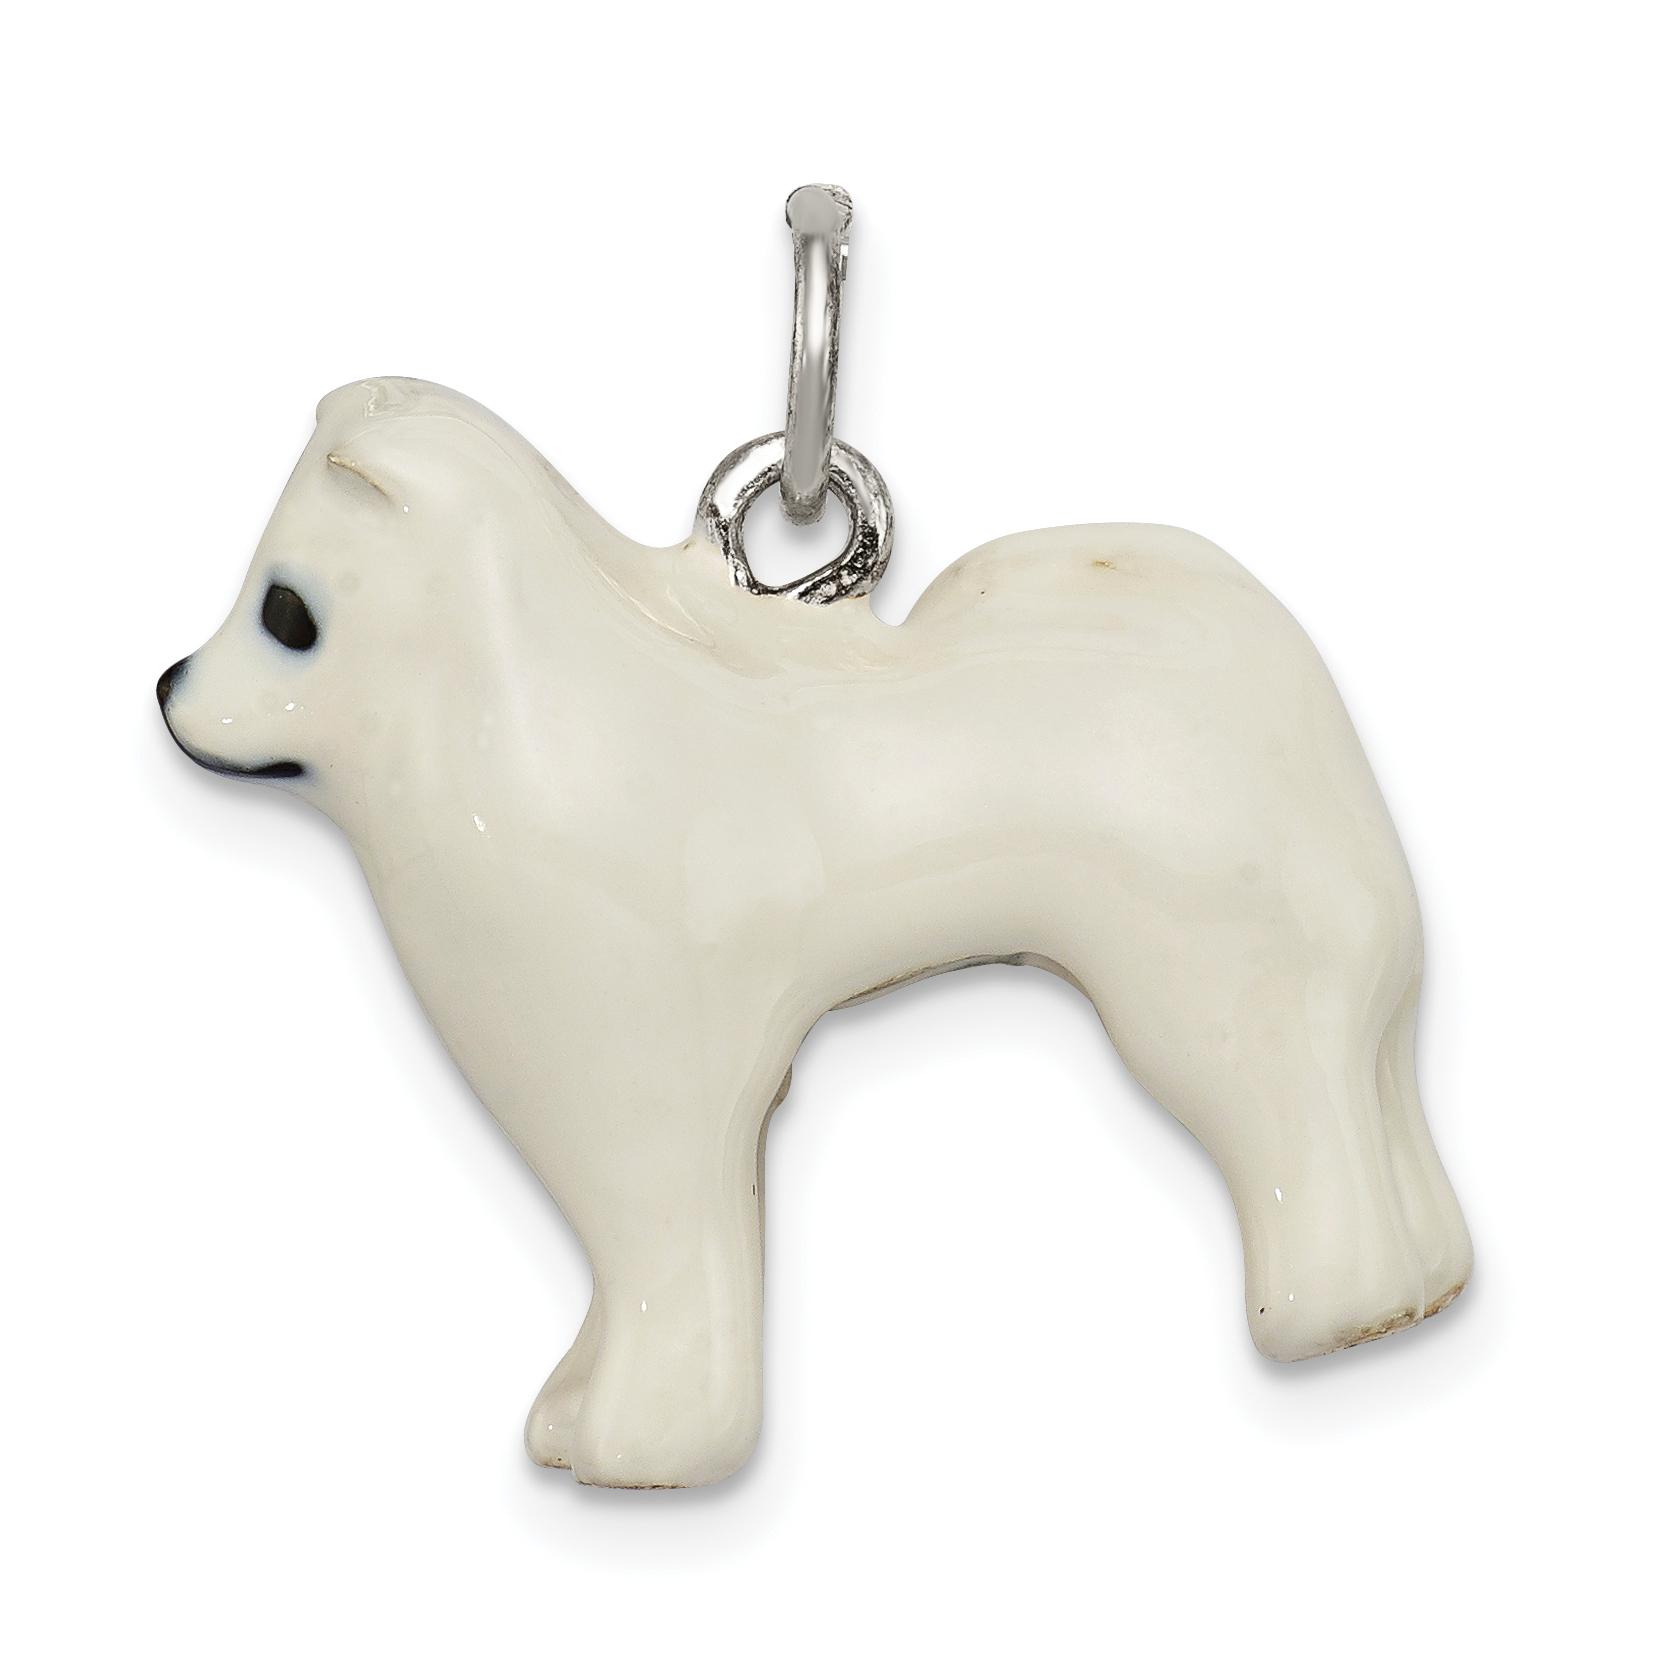 6 X PUPPY DOG ENAMEL COATED CHARMS//PENDANTS JEWELLERY MAKING